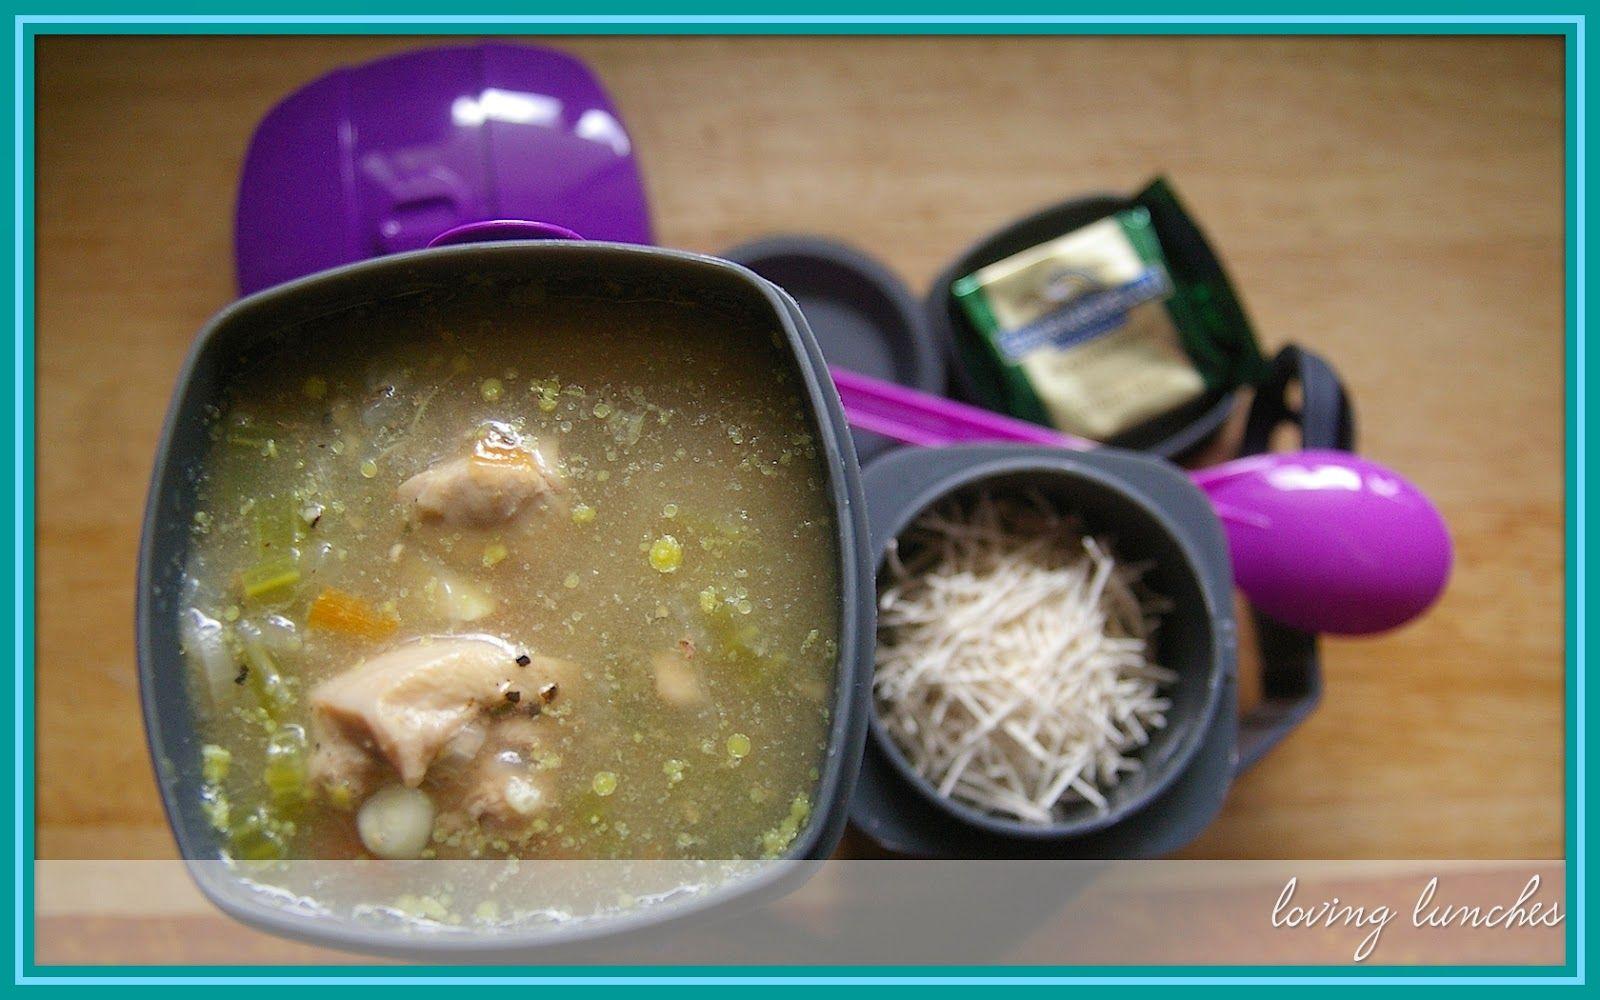 Chicken Noodle Soupmaker Soup @kambrook @compleat